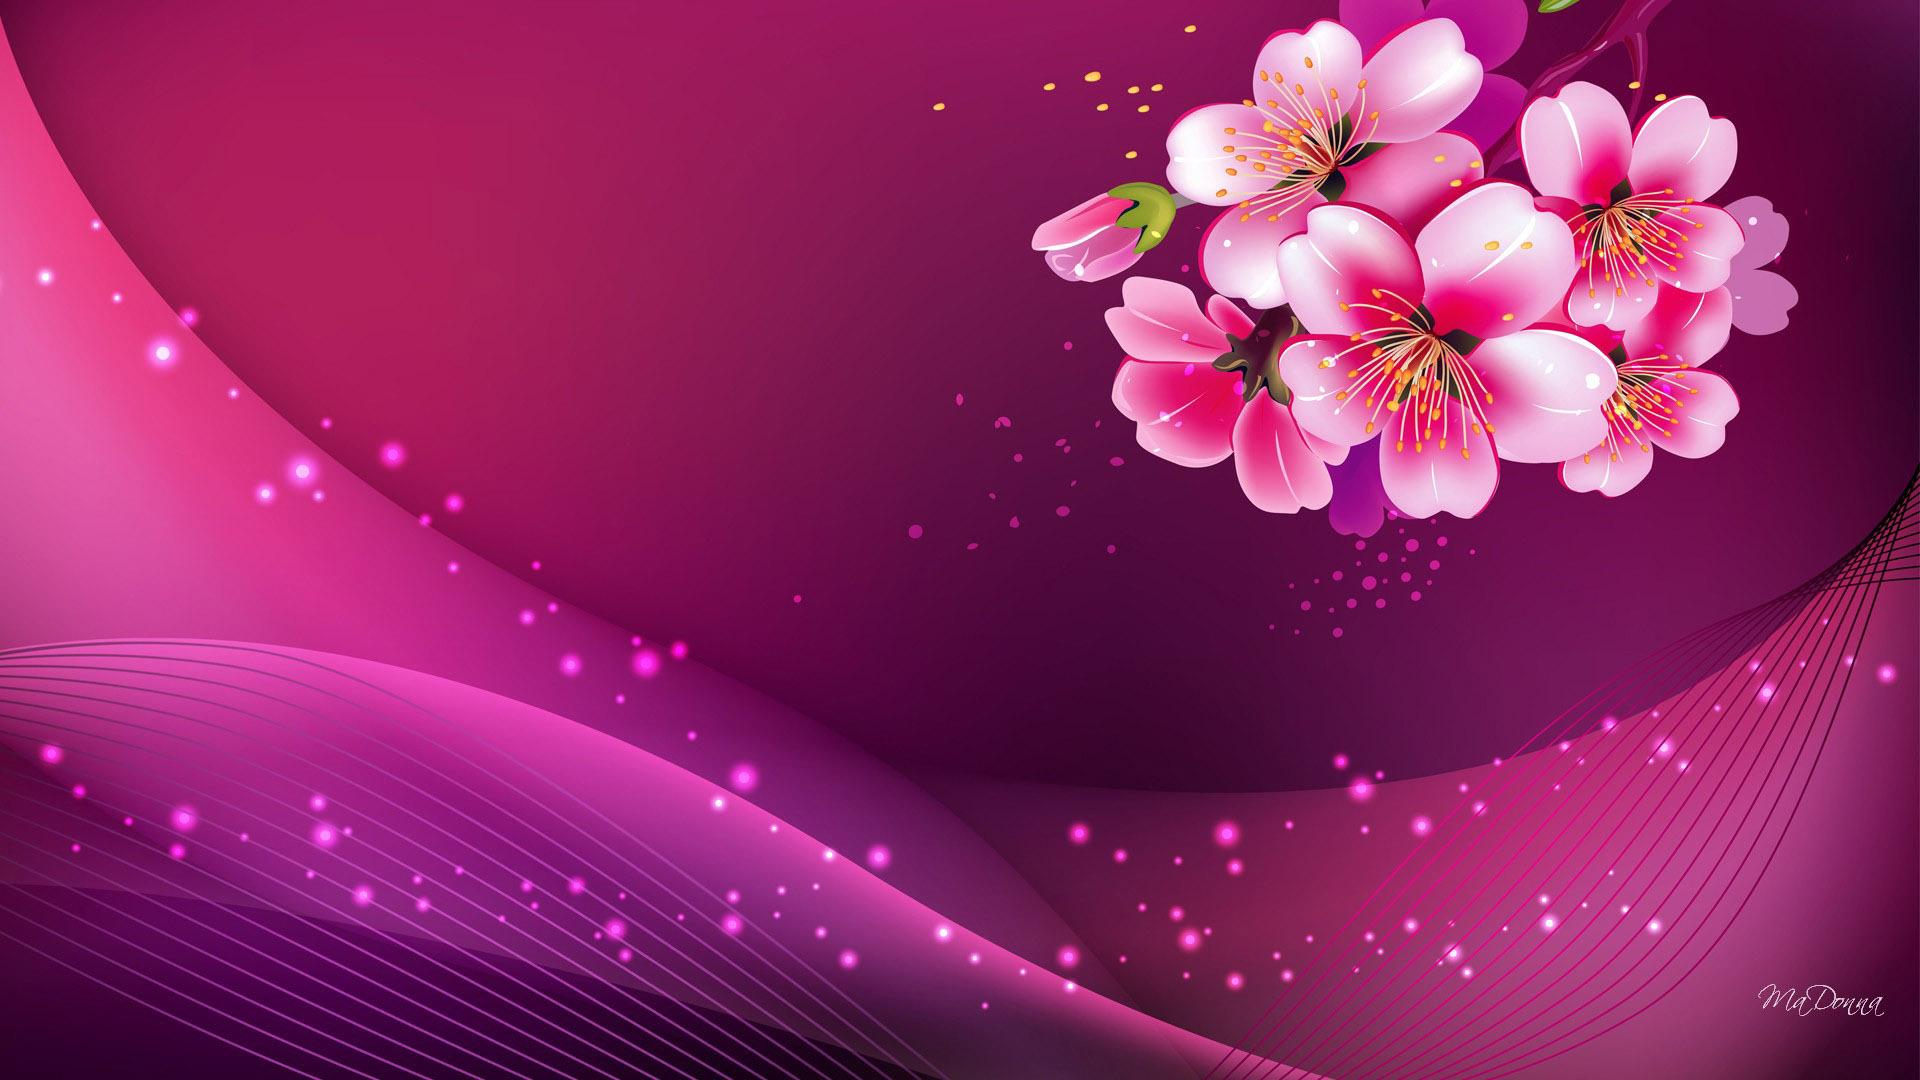 Pink Abstract HD